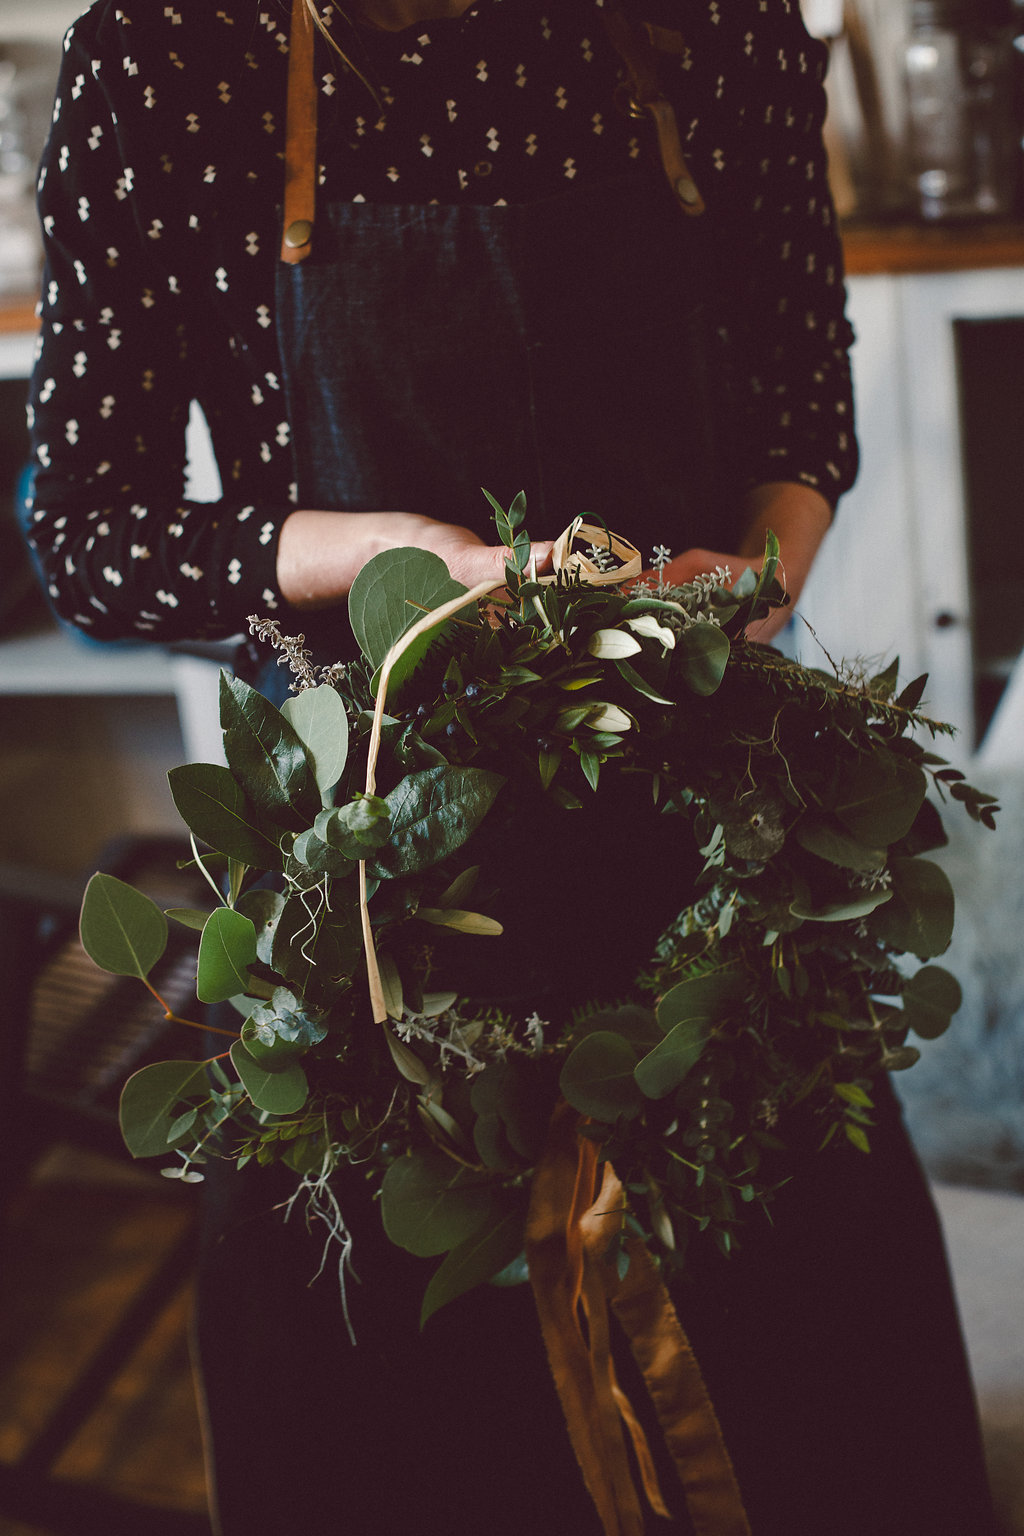 flower-workshop-wreath-making-the-good-florist-50.jpg